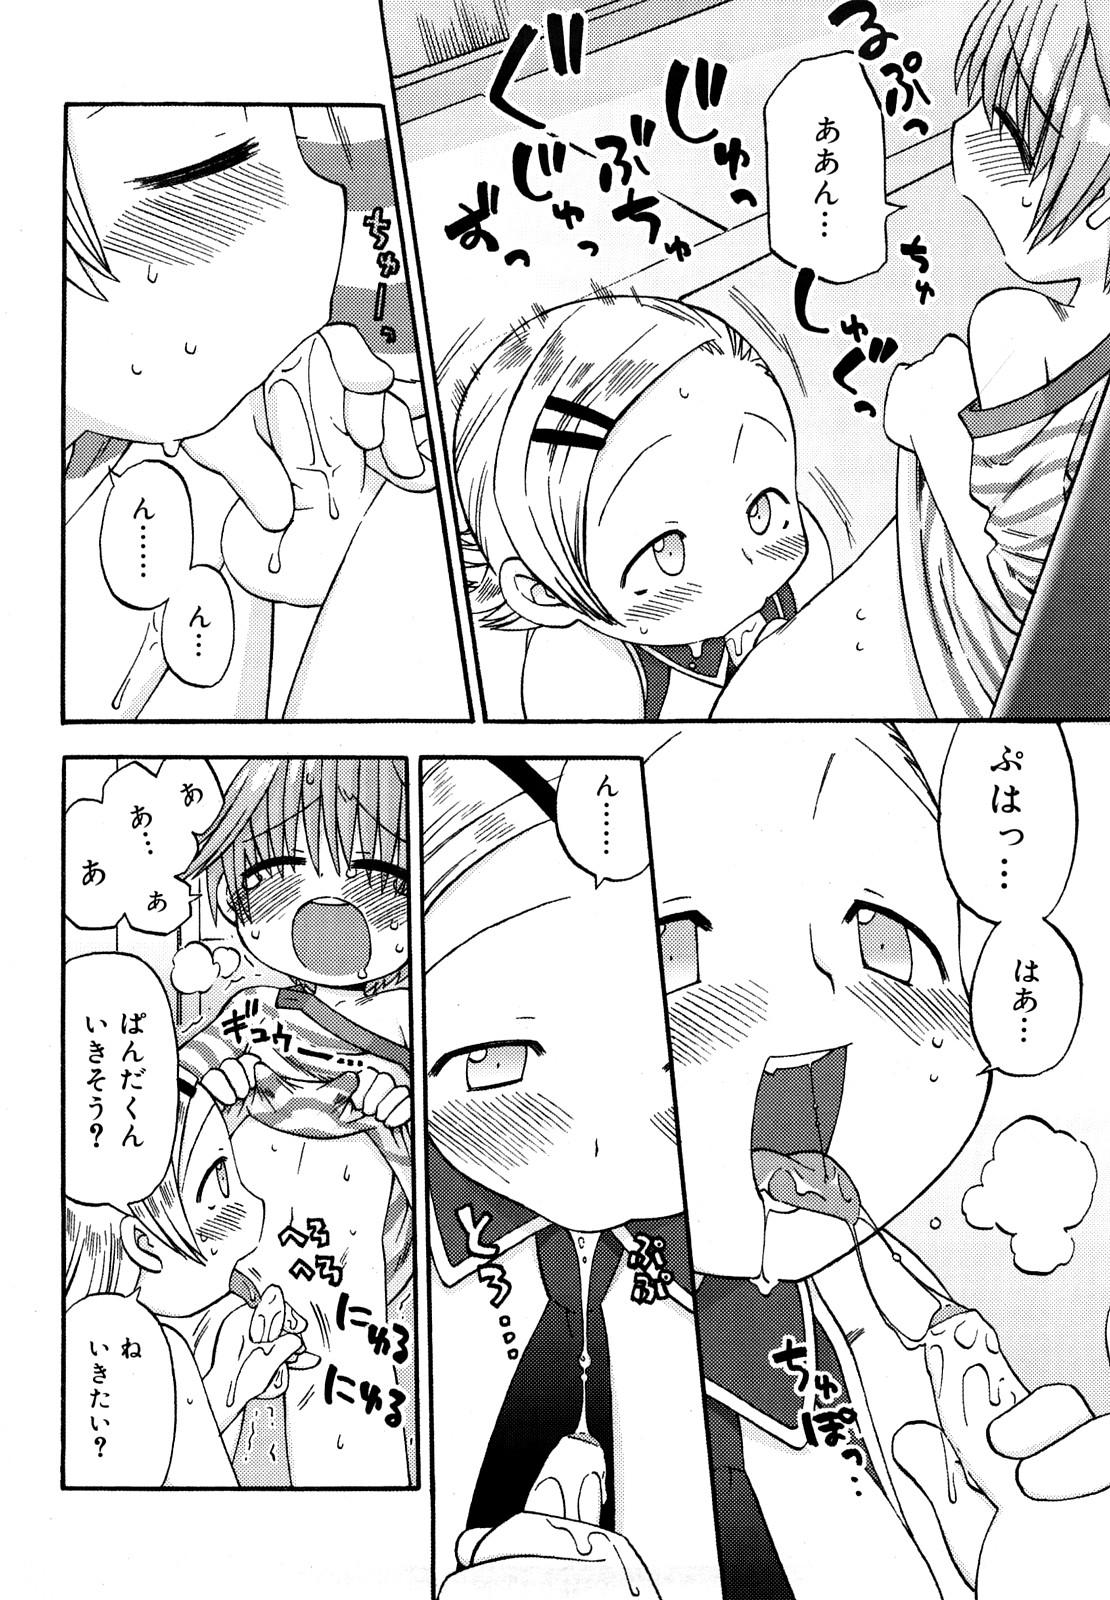 Hatsuden Pandakun! Shinsouban 10